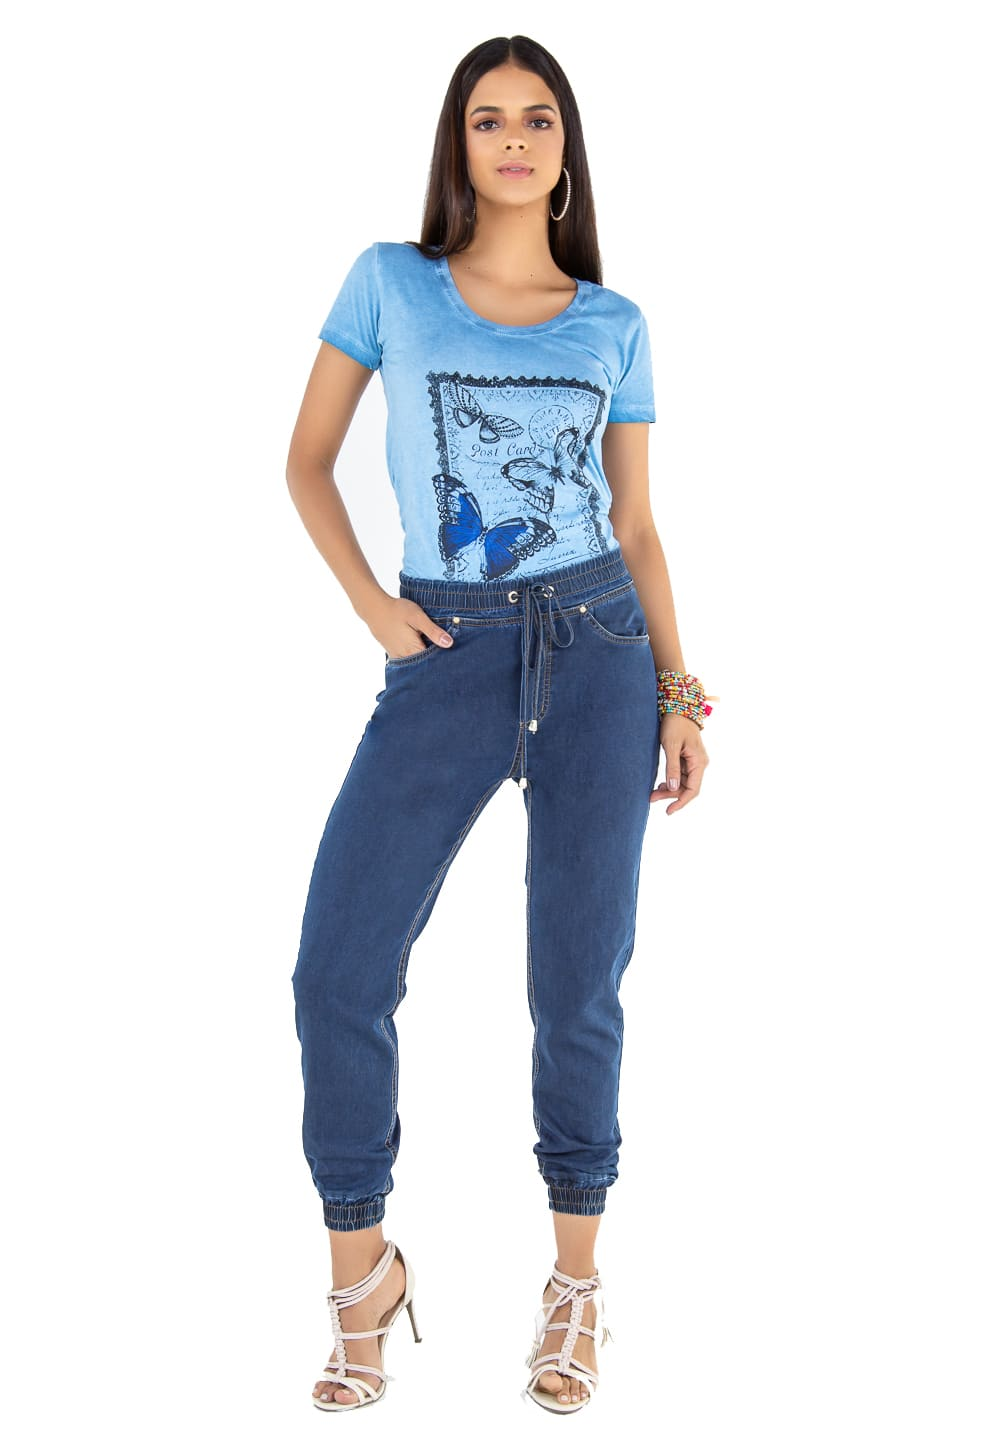 Calça Feminina Jeans Jogger